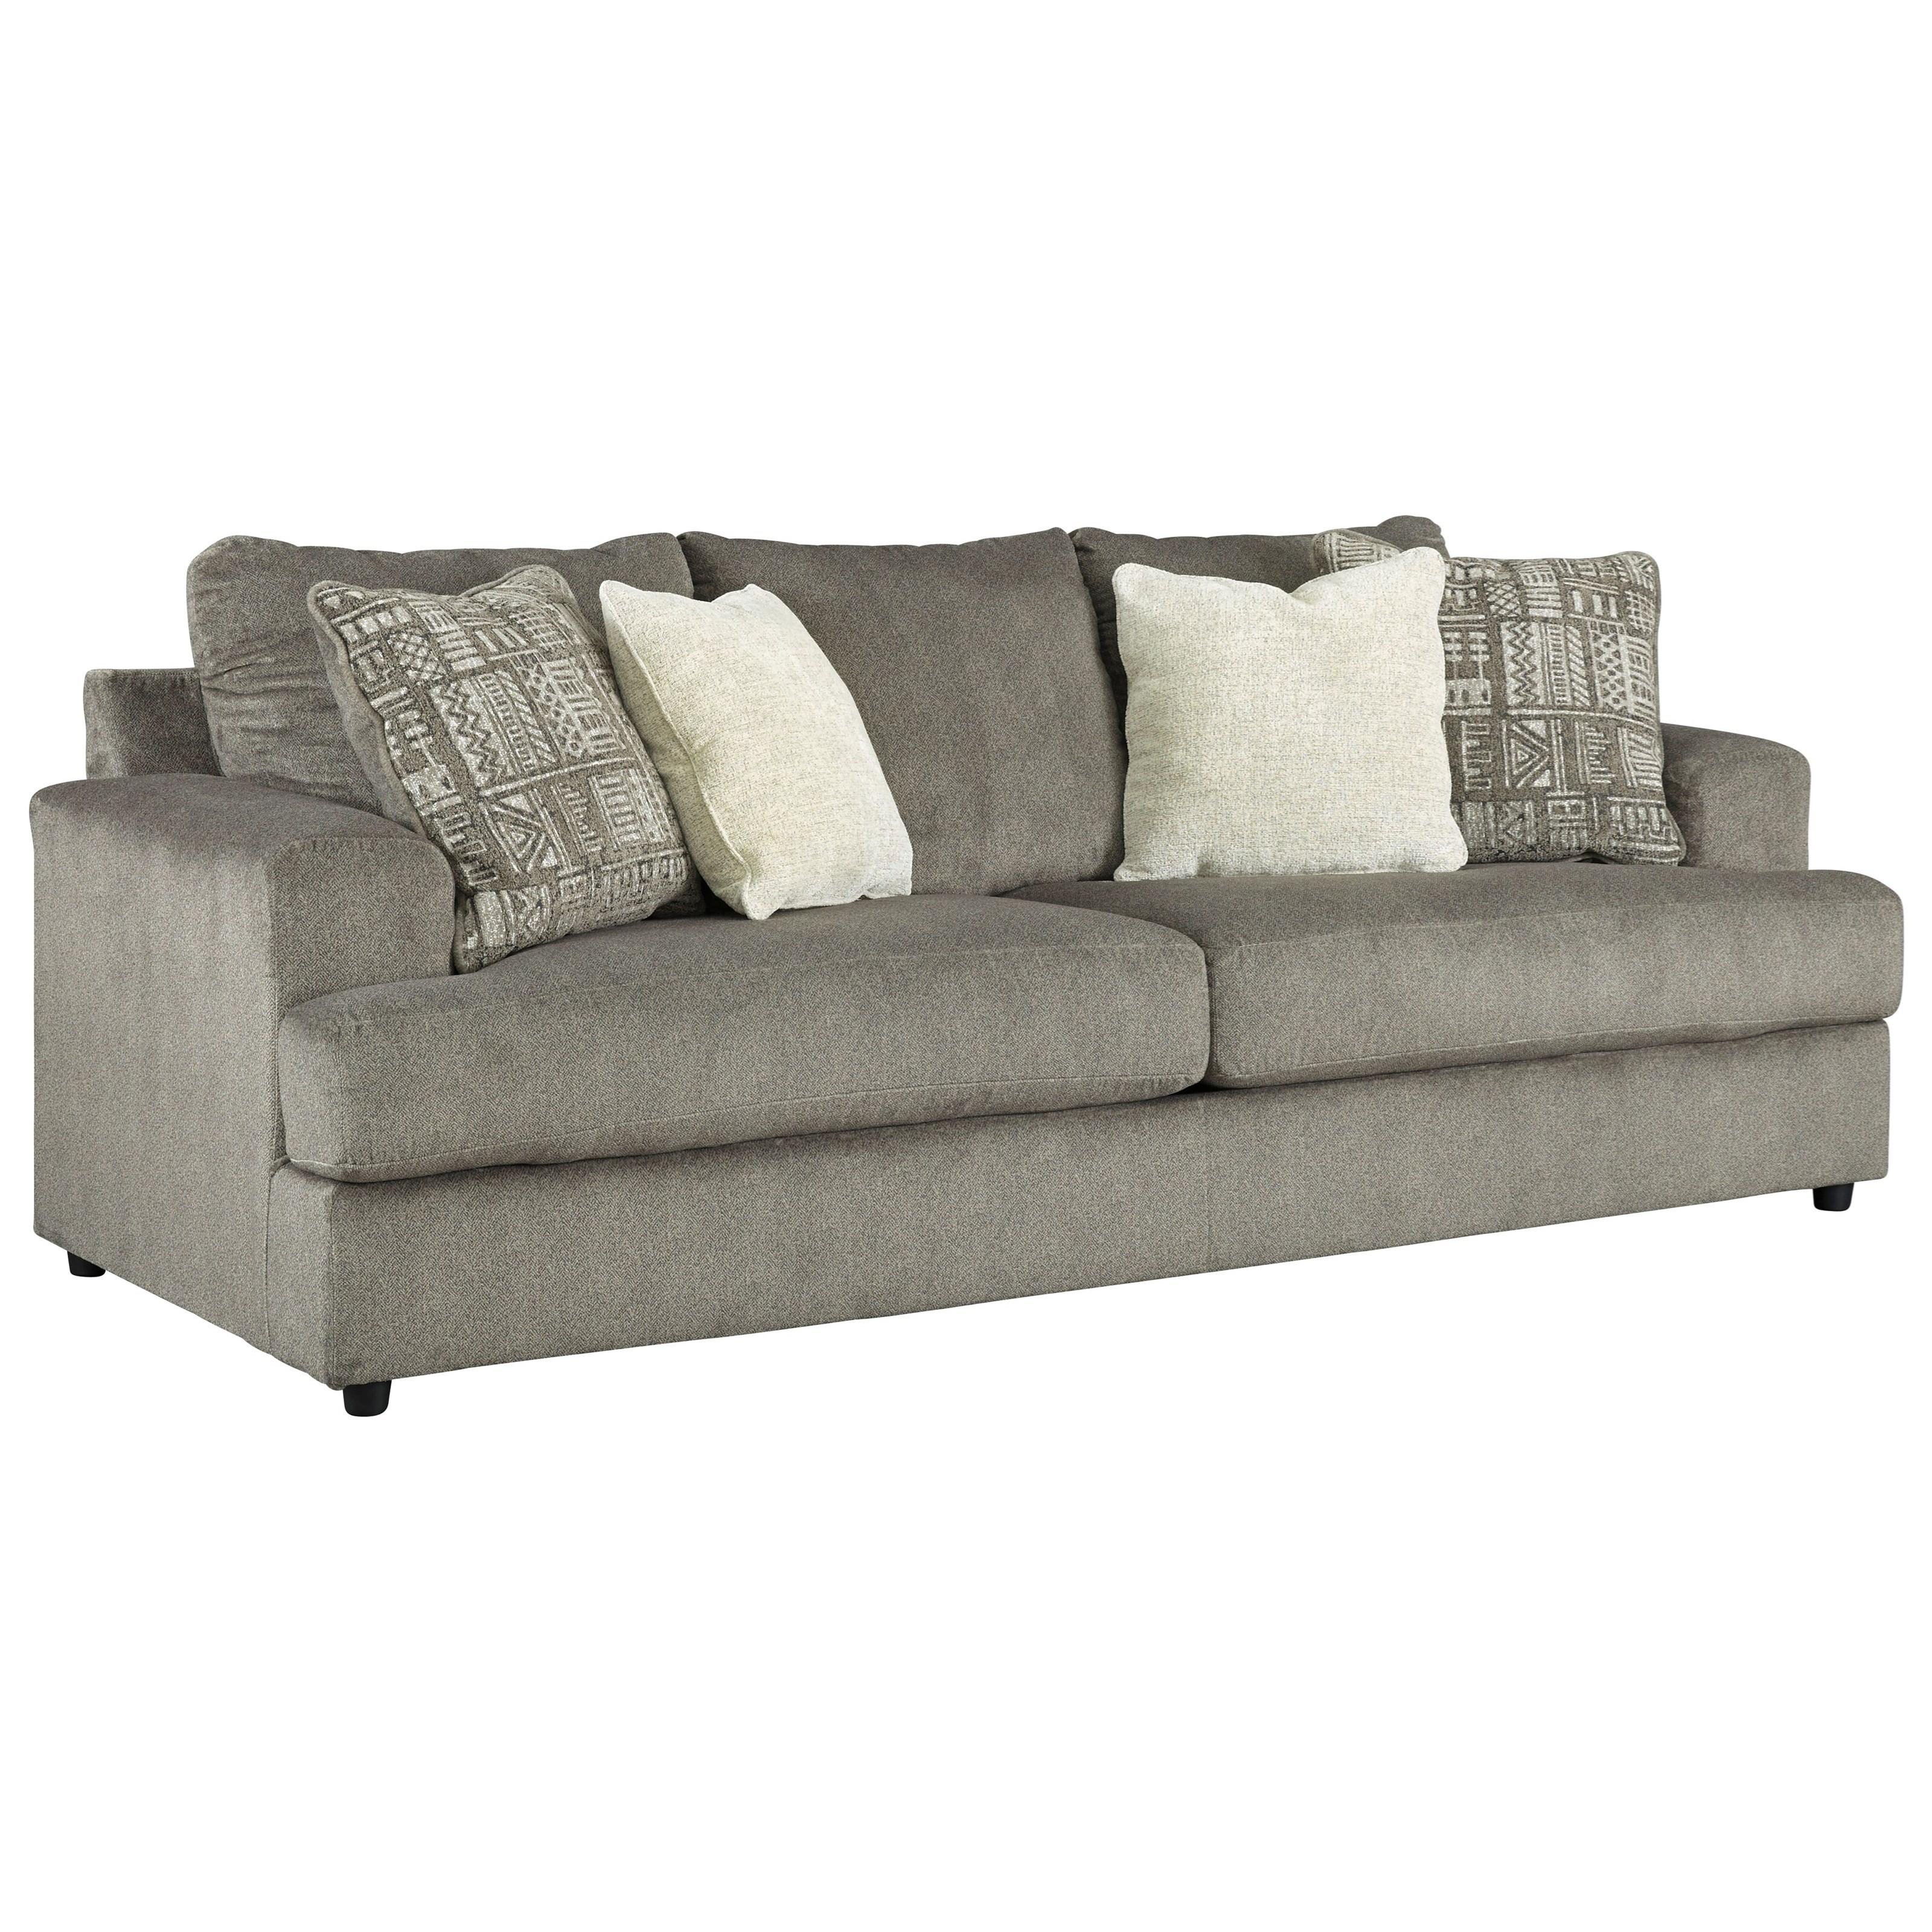 Soletren Sofa by Ashley (Signature Design) at Johnny Janosik